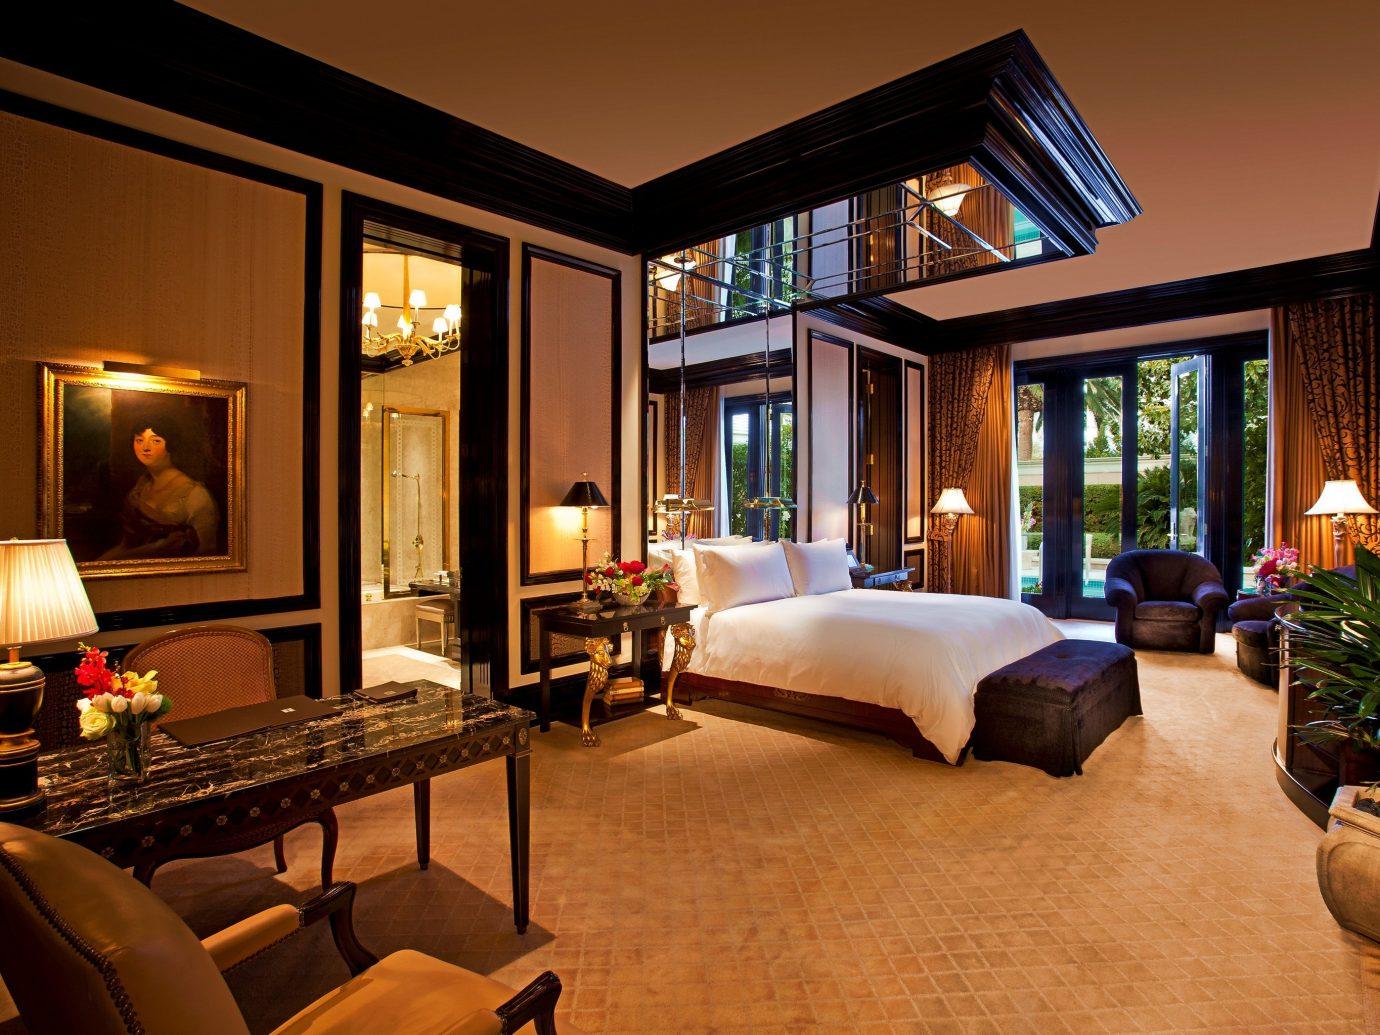 Bedroom in a Three-Bedroom Villa at The Mirage Resort & Casino in Las Vegas